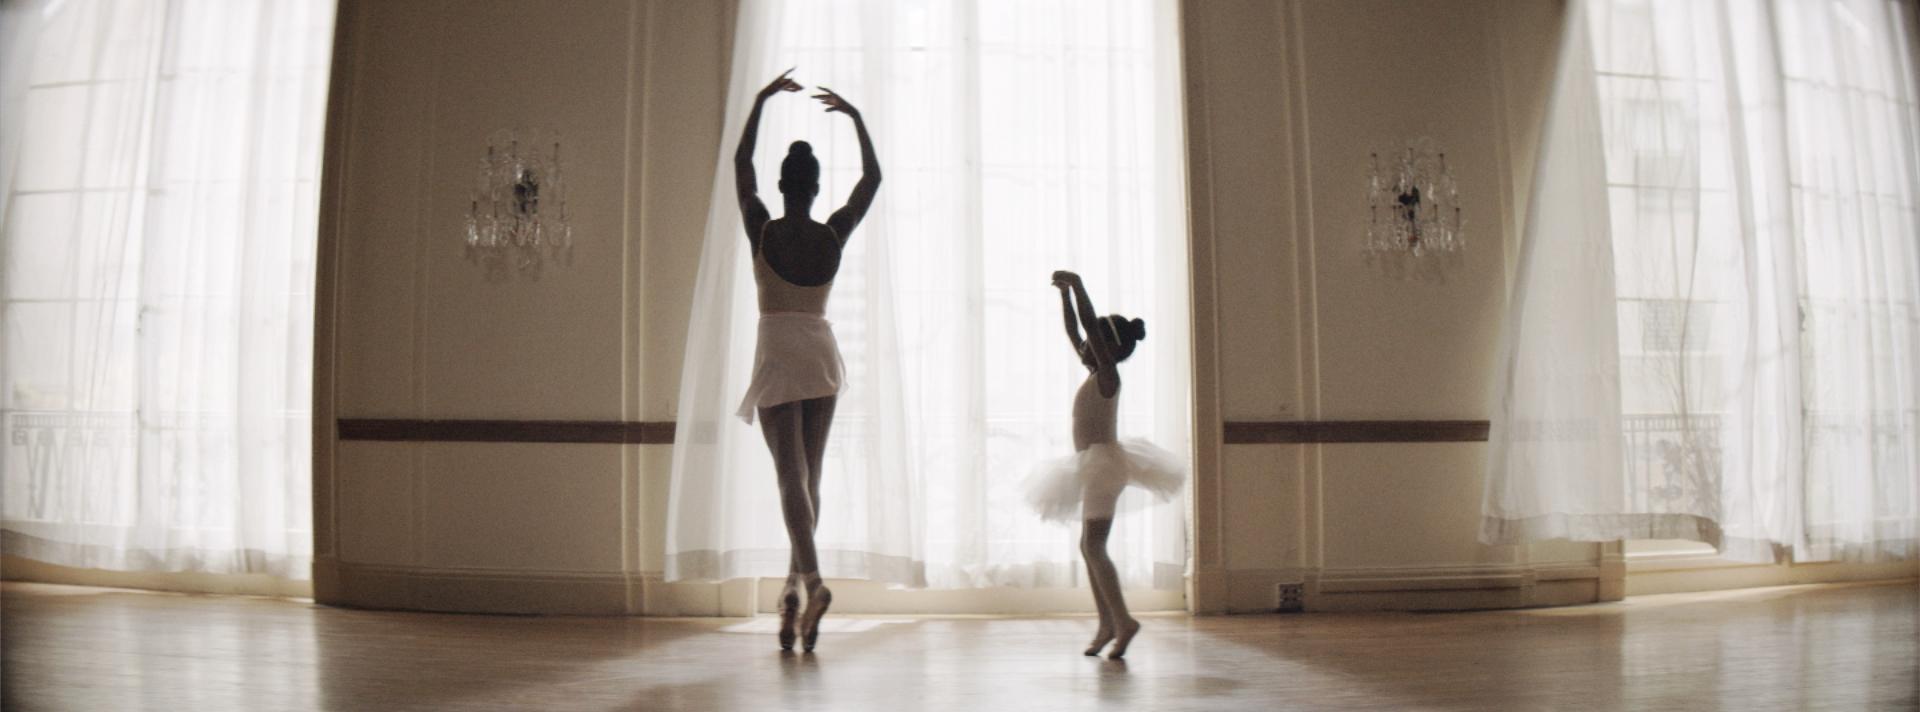 ballet-wide